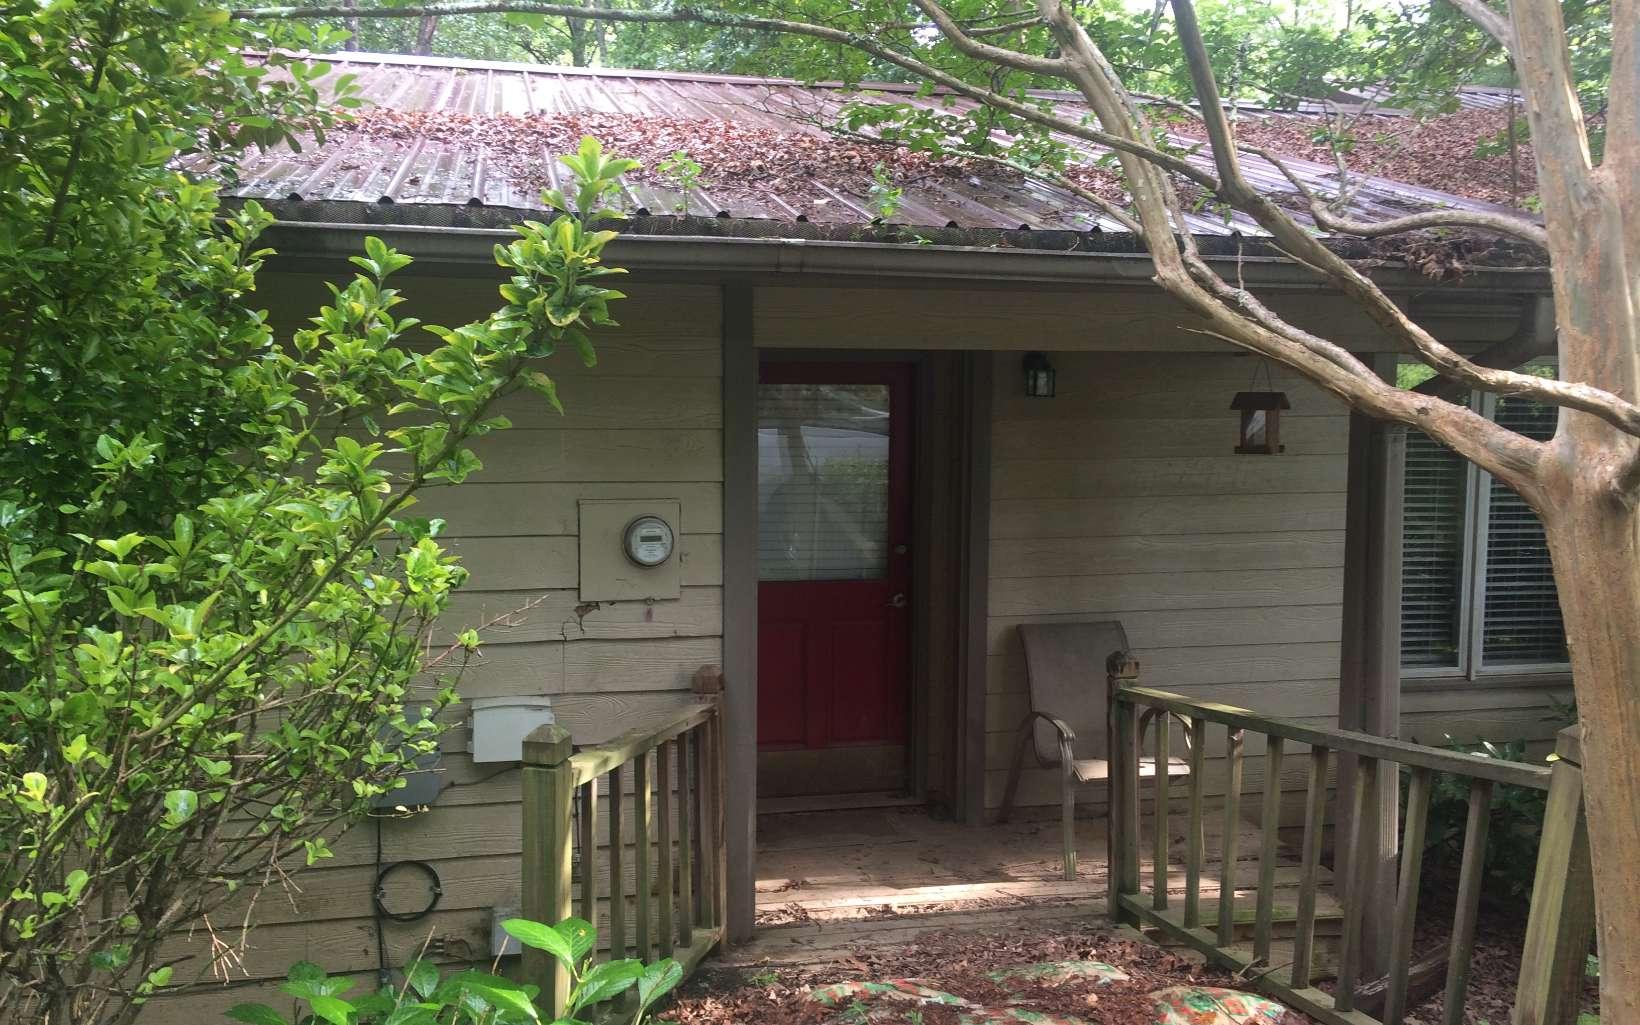 Homes for Sale in Blairsville, GA under $200k